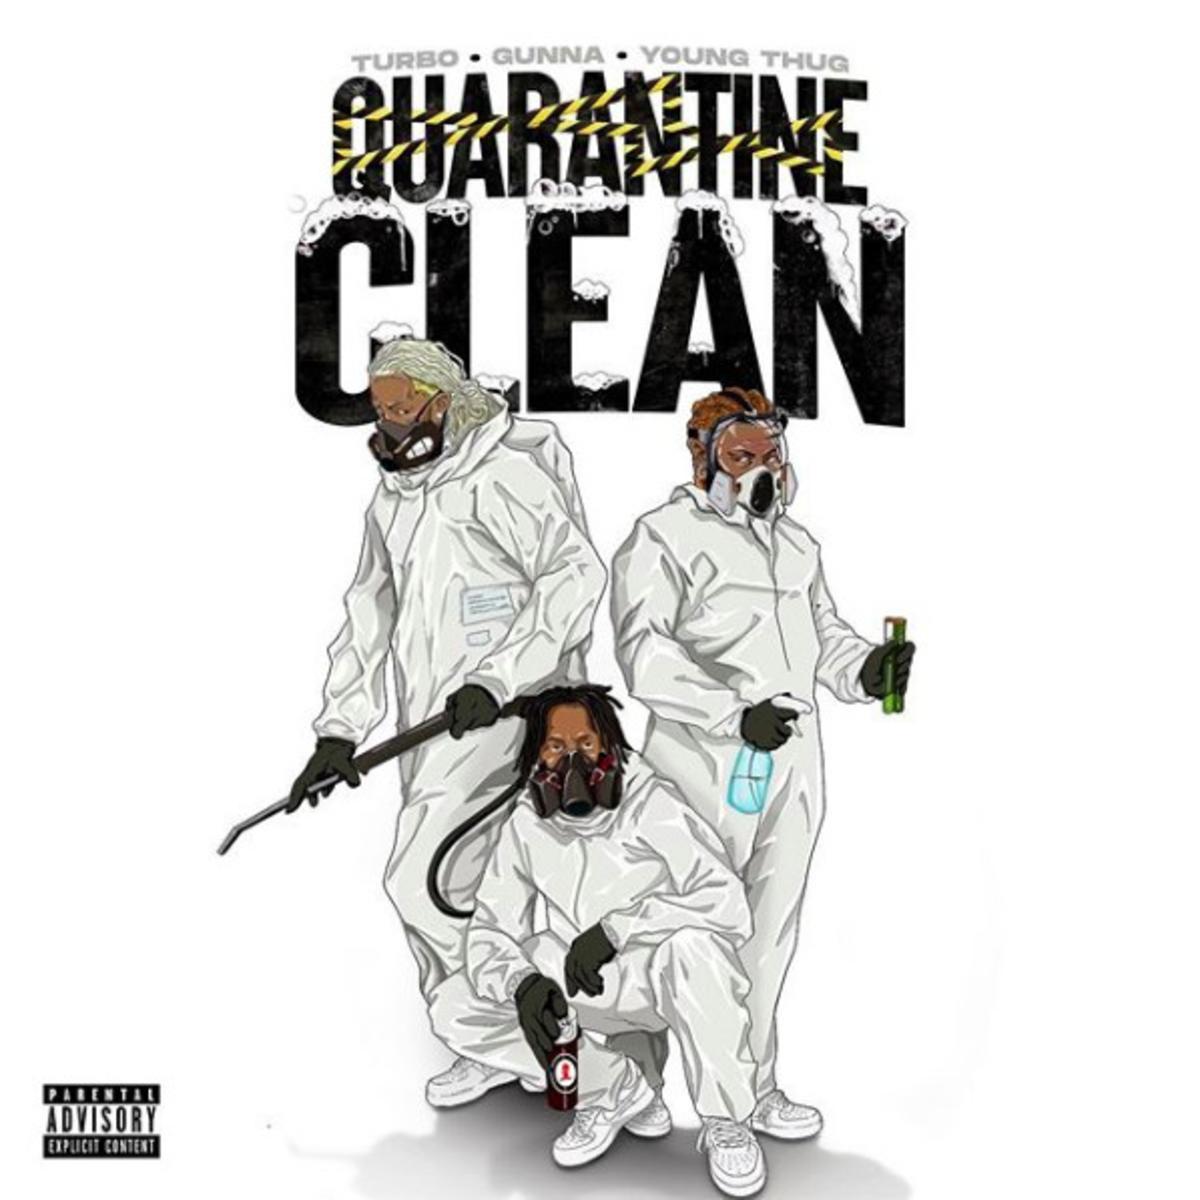 Turbo Ft. Gunna & Young Thug - Quarantine Clean